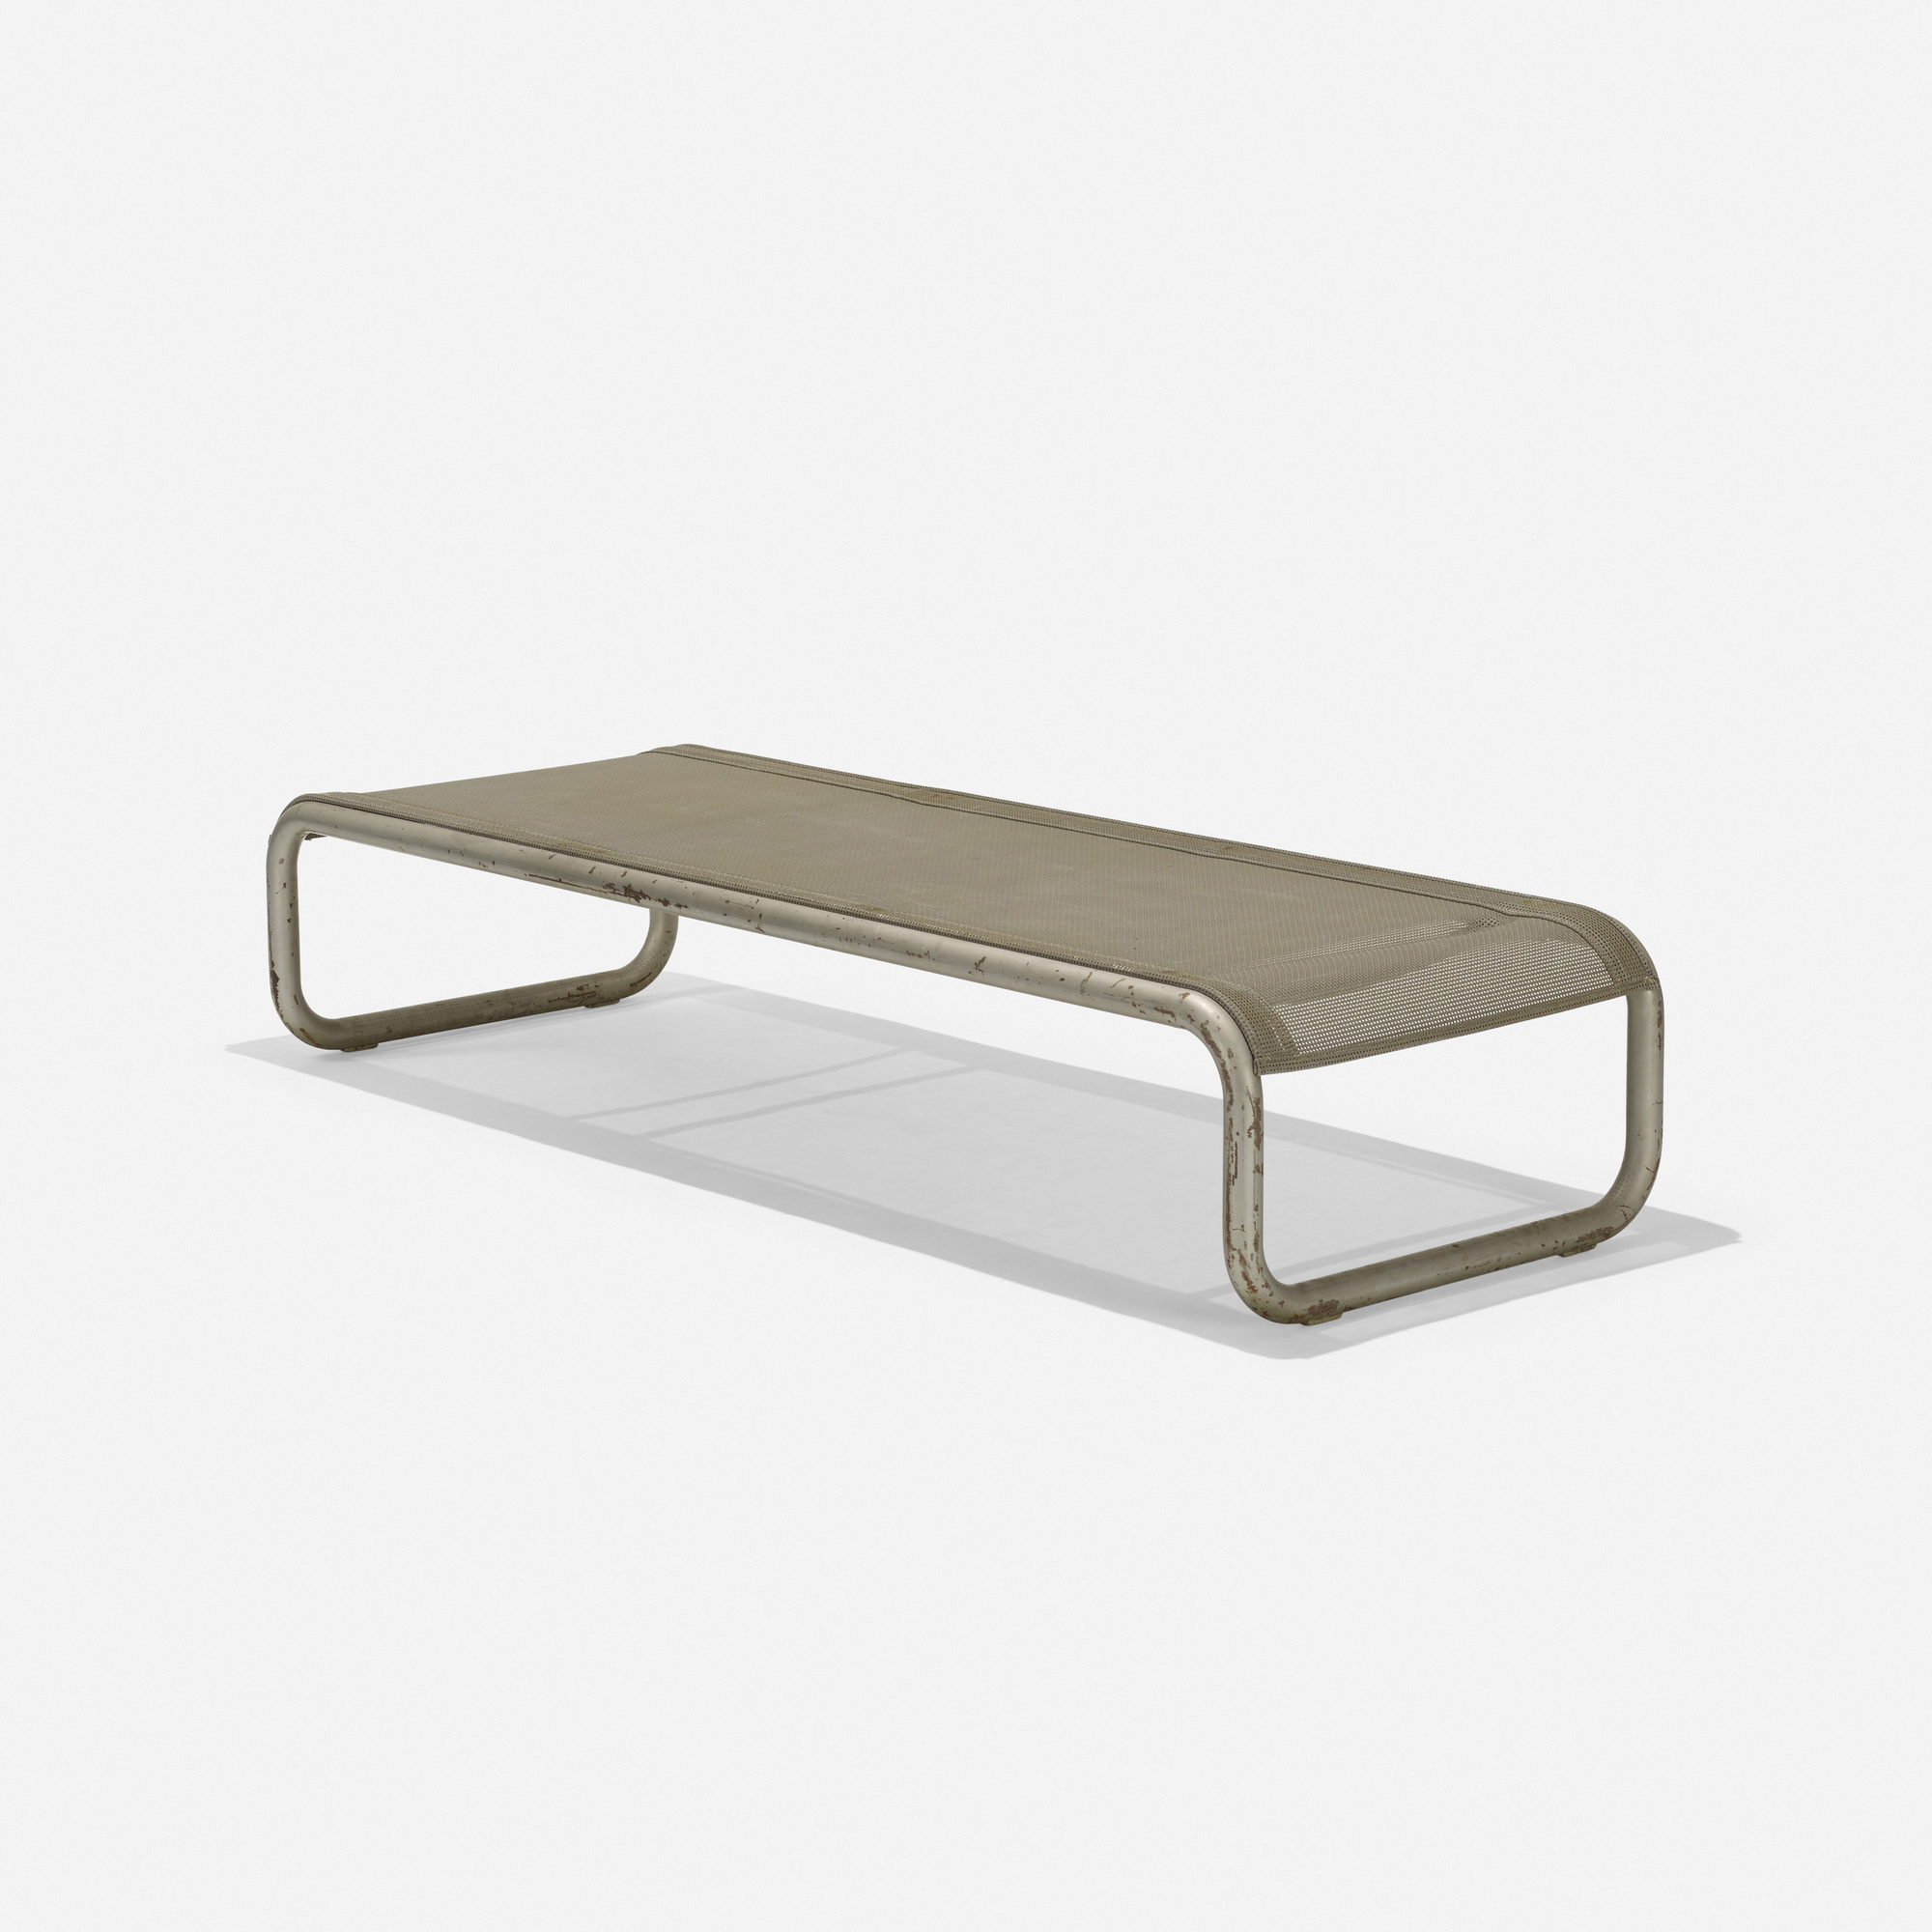 ca4822cf2c81 ... 135  Richard Schultz   Prototype adjustable chaise lounge (3 of 3)